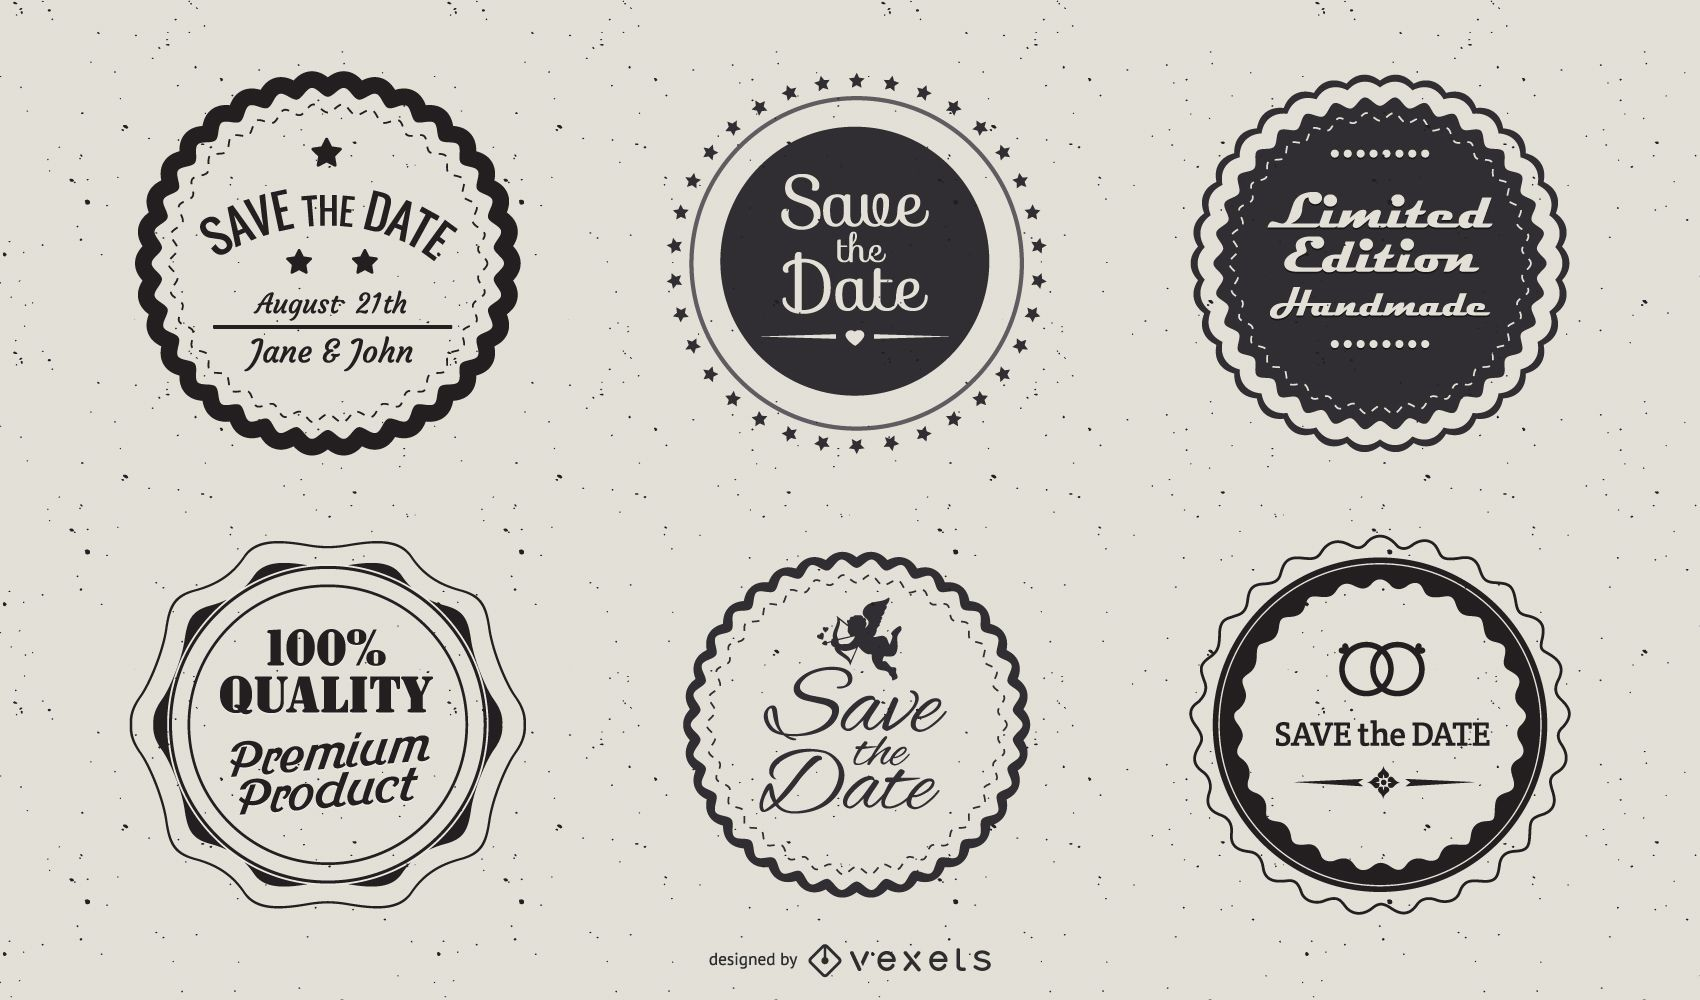 Vintage Circular Label Pack Template